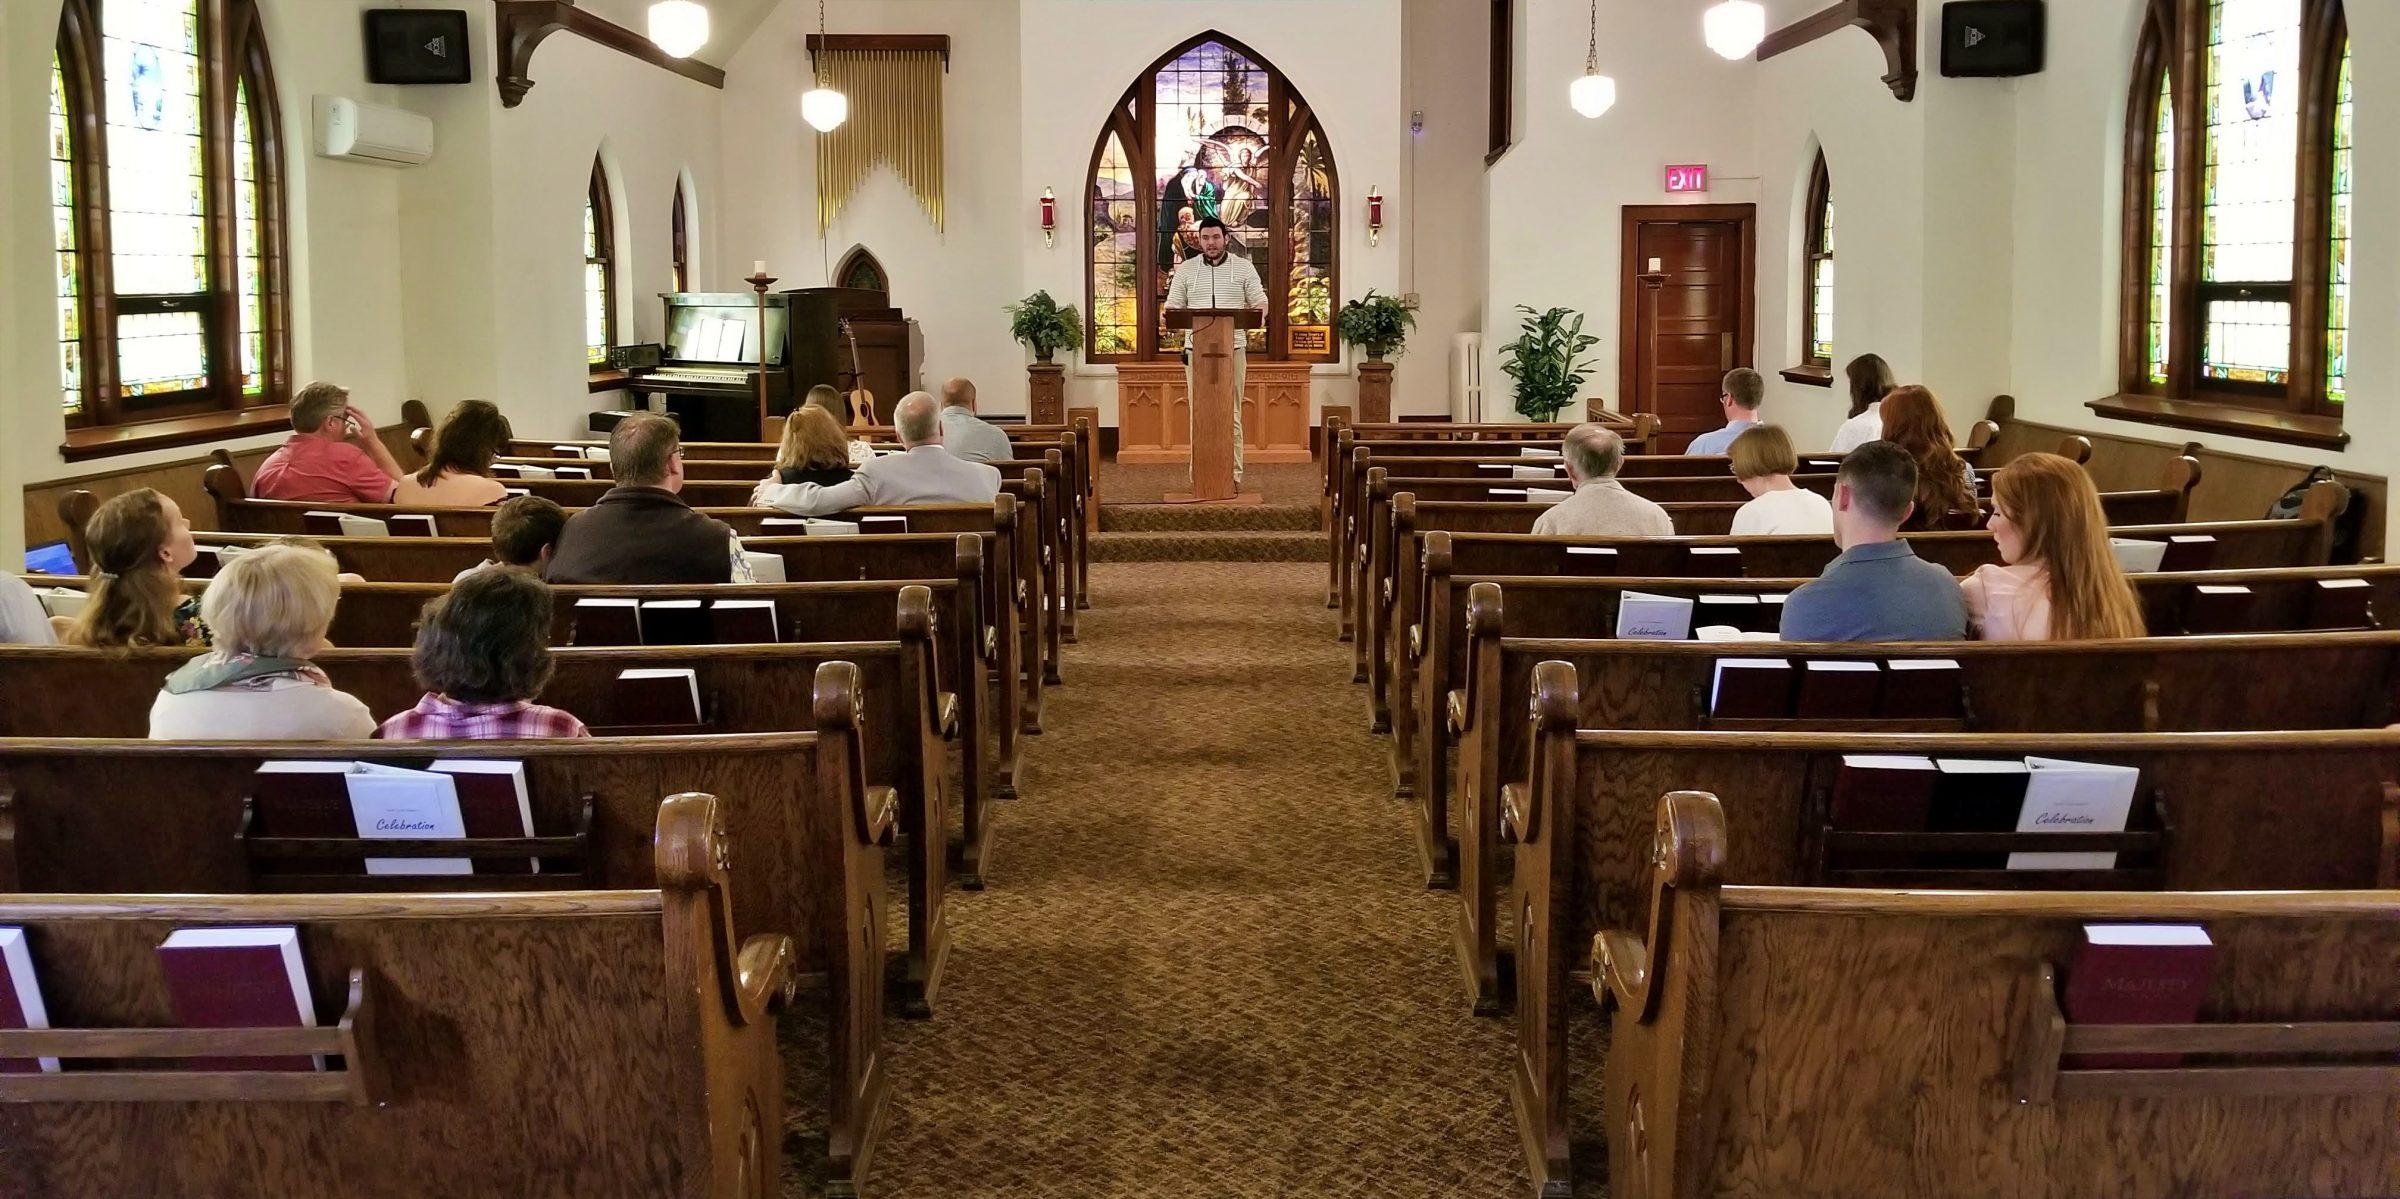 Sand Creek Baptist